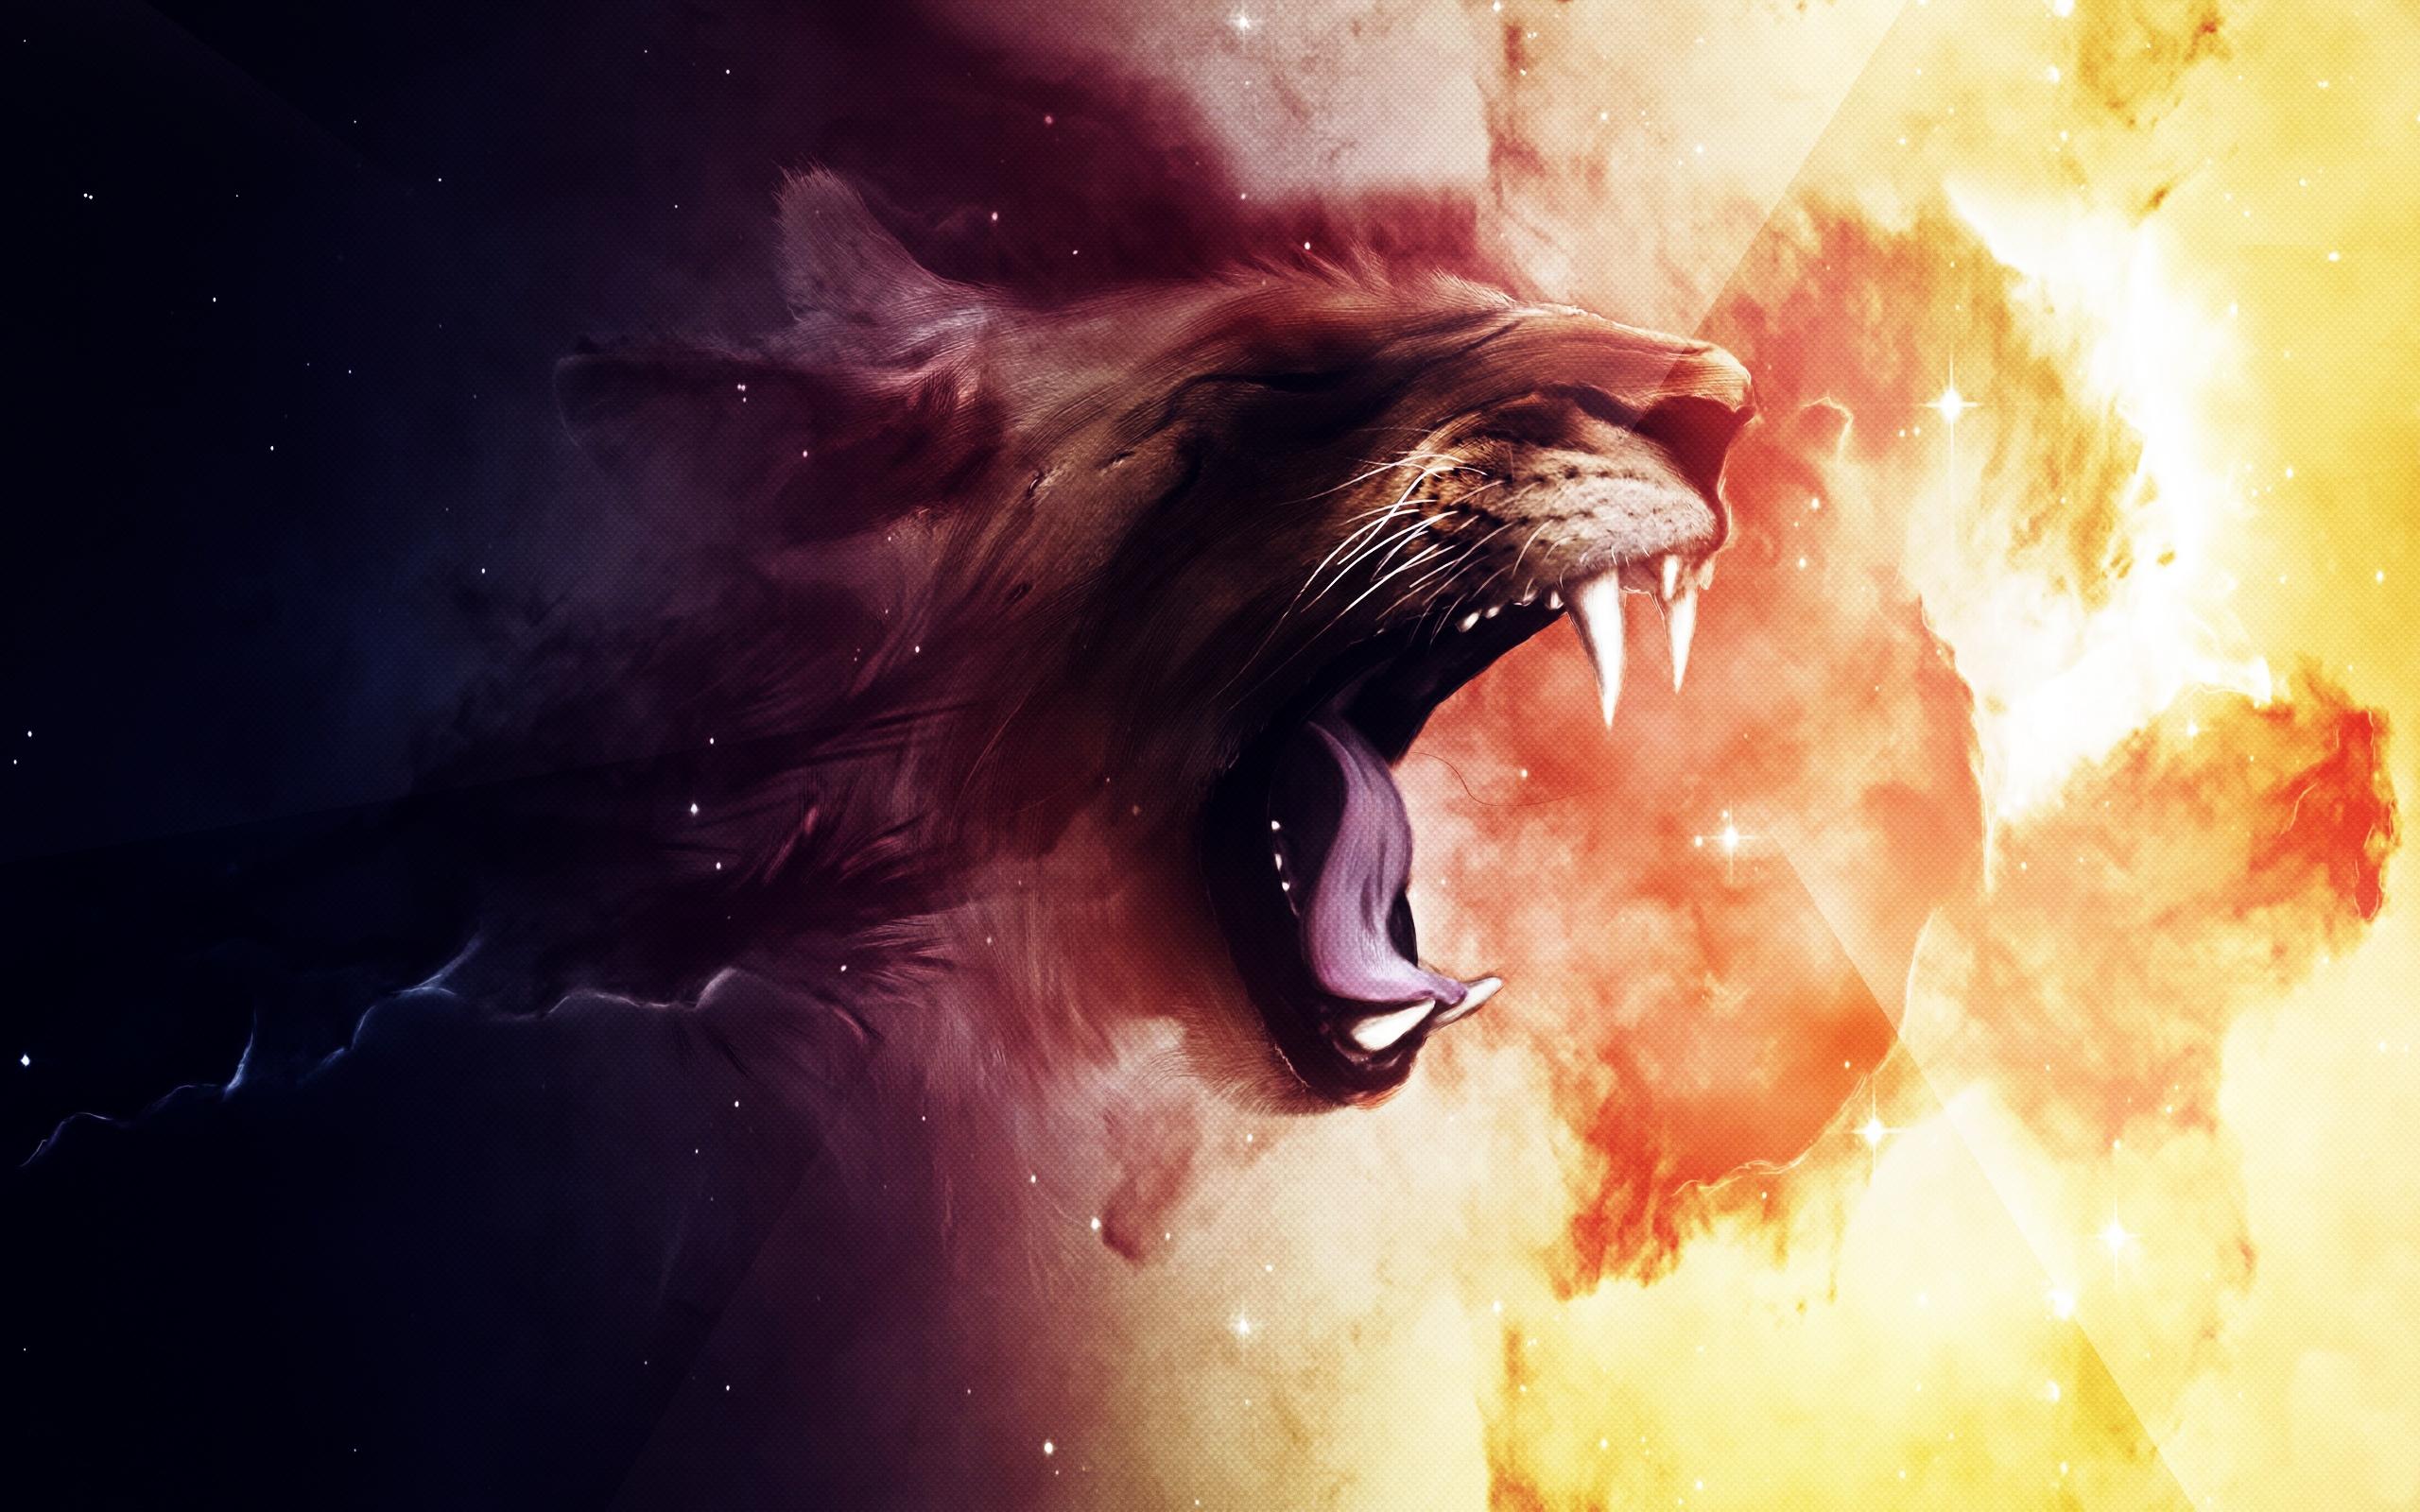 Roaring Lion Wallpapers HD 2560x1600